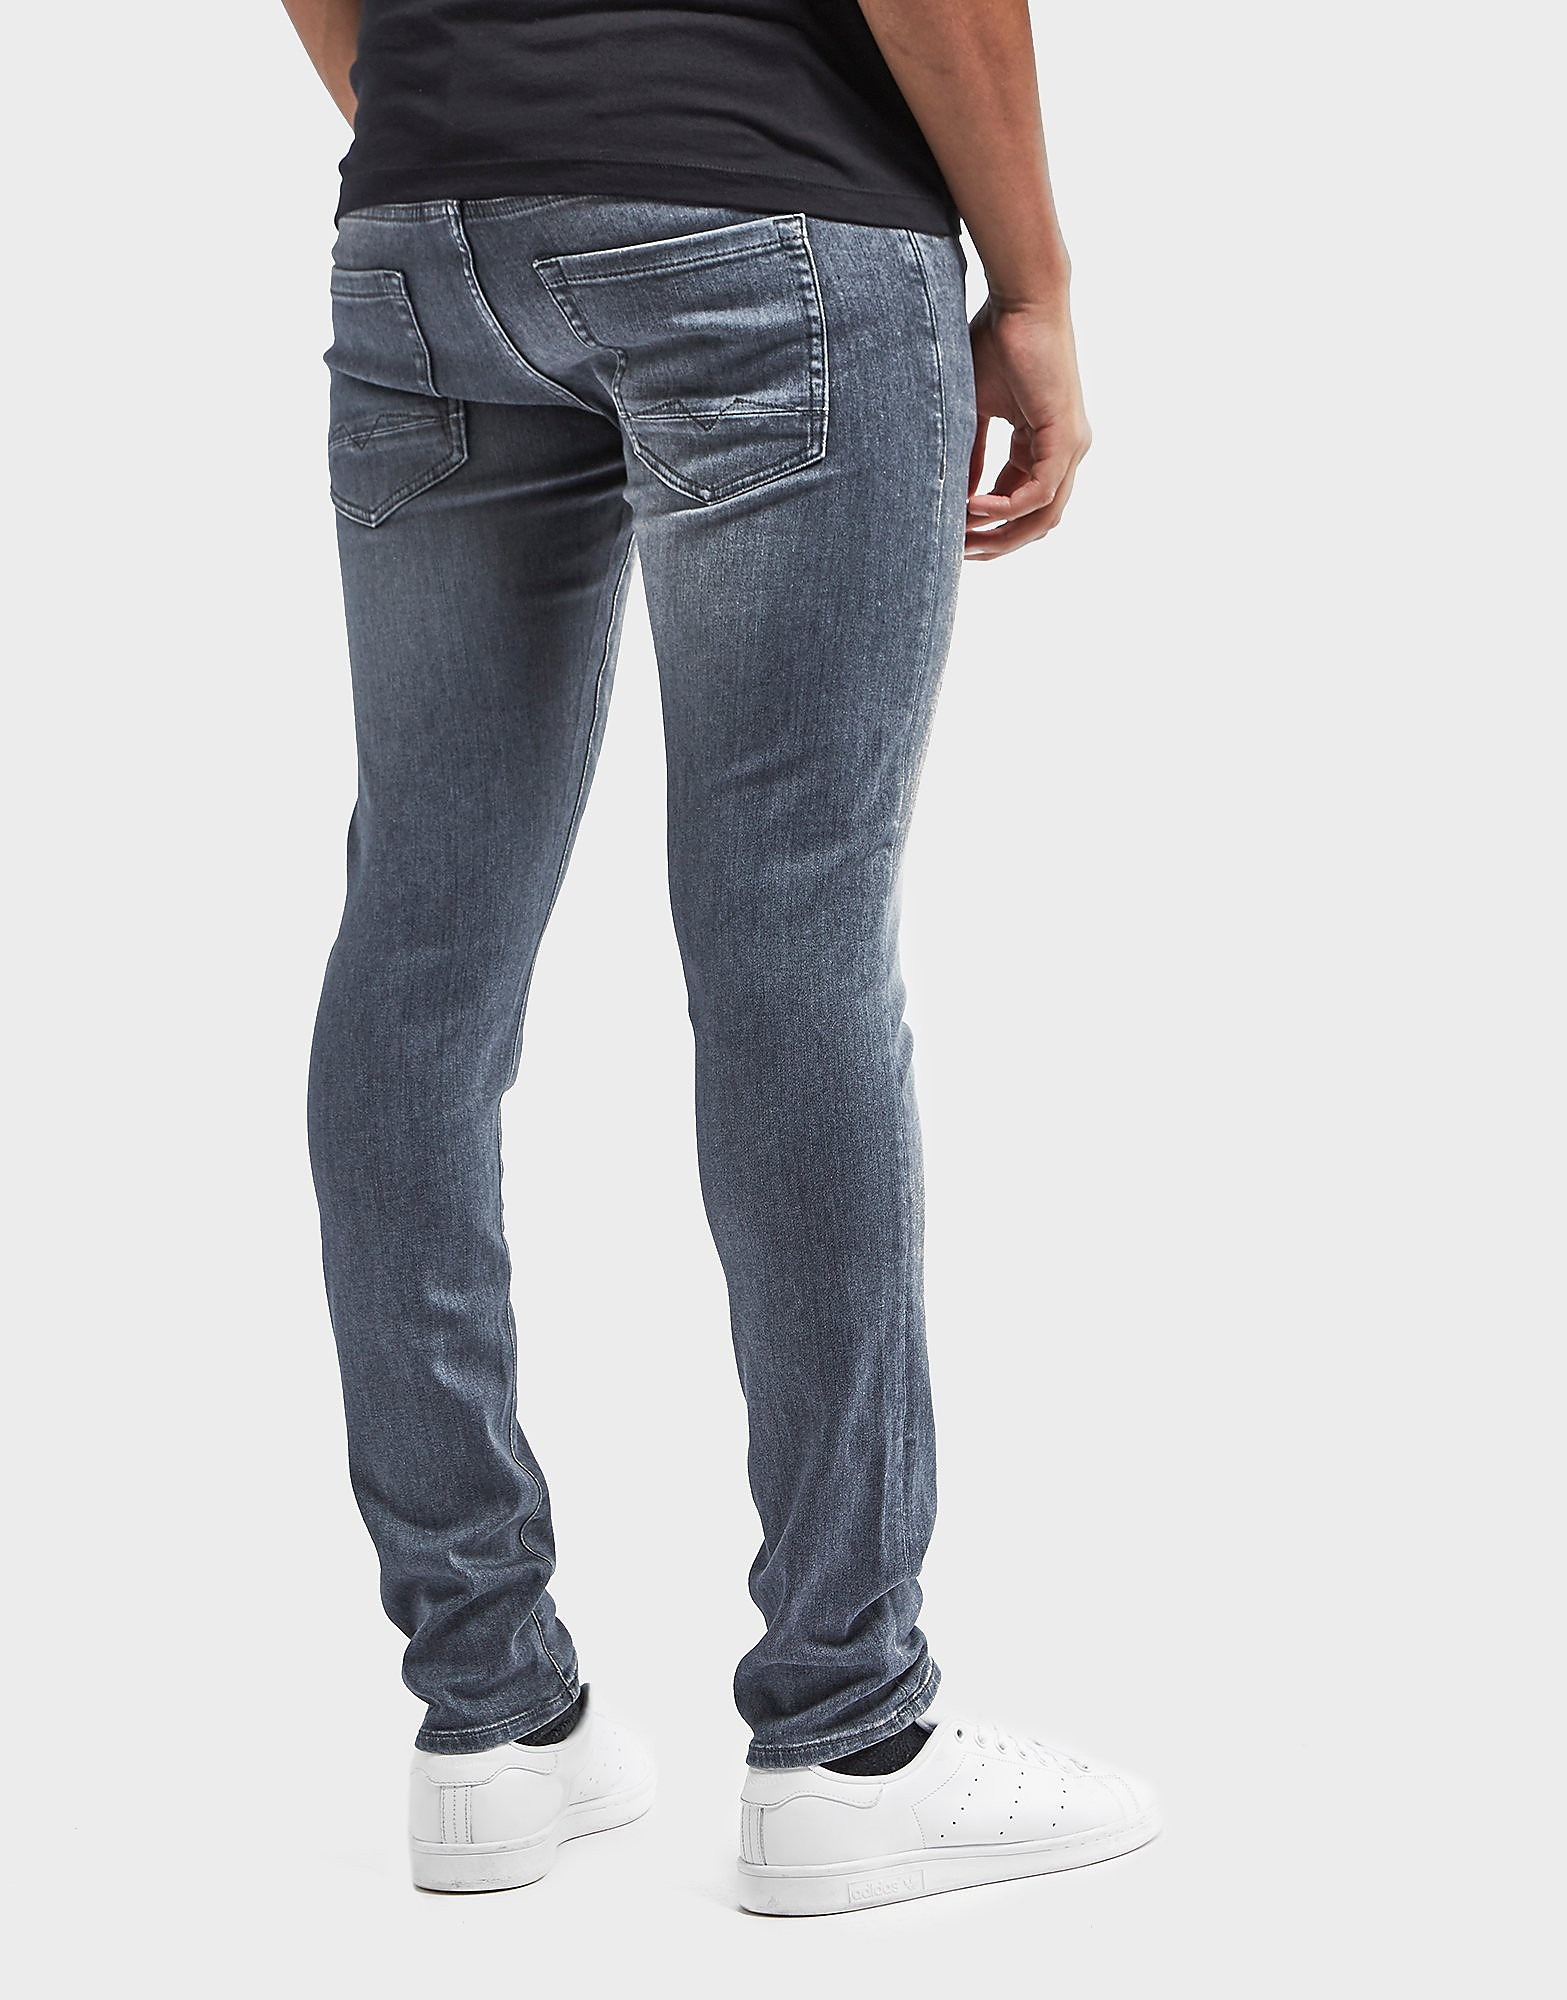 BOSS Orange 72 Skinny Jeans